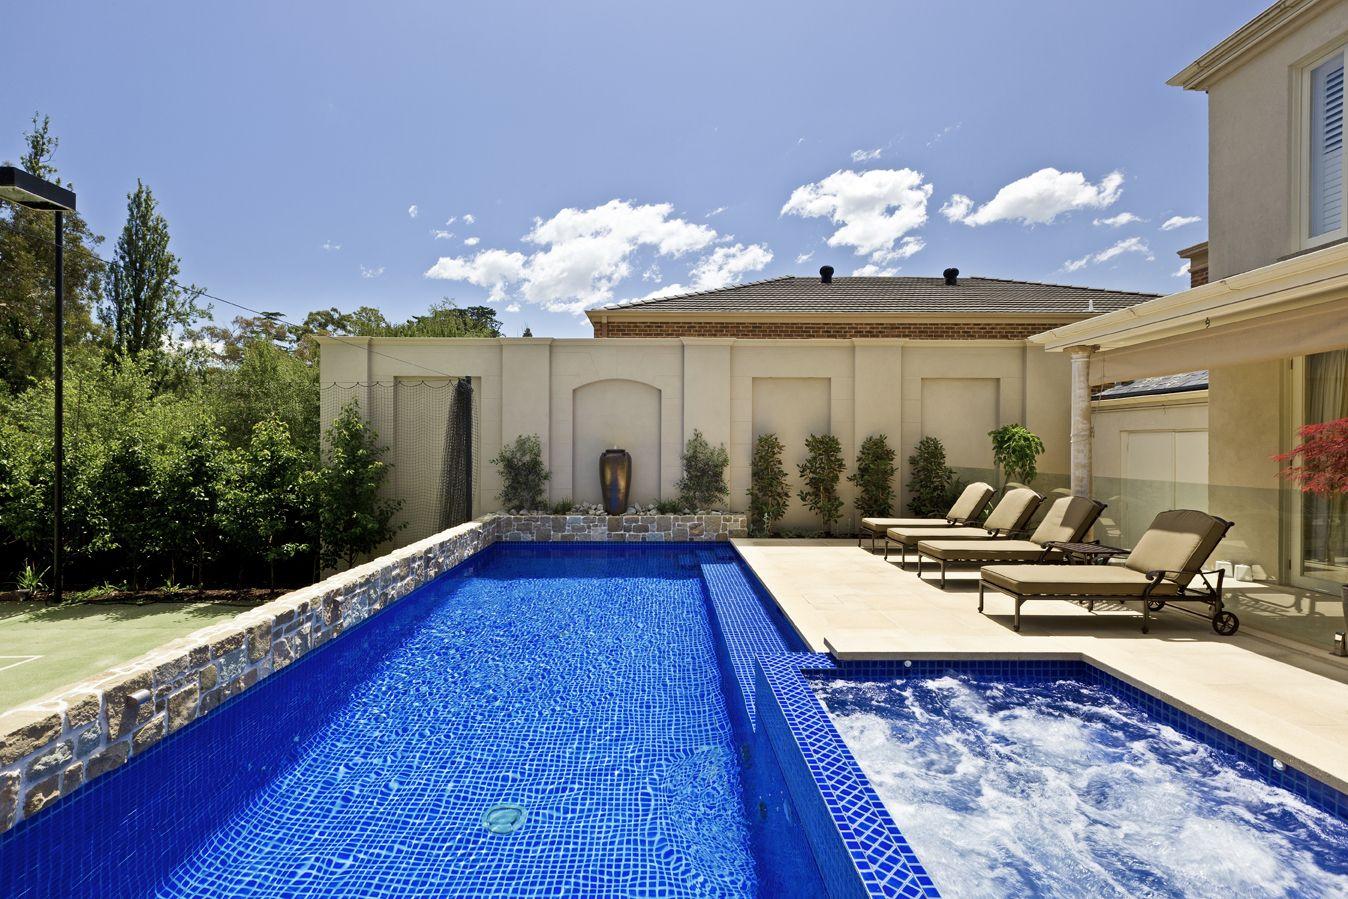 dark pool tiles - Google Search | Pools | Pinterest | Courtyard ...